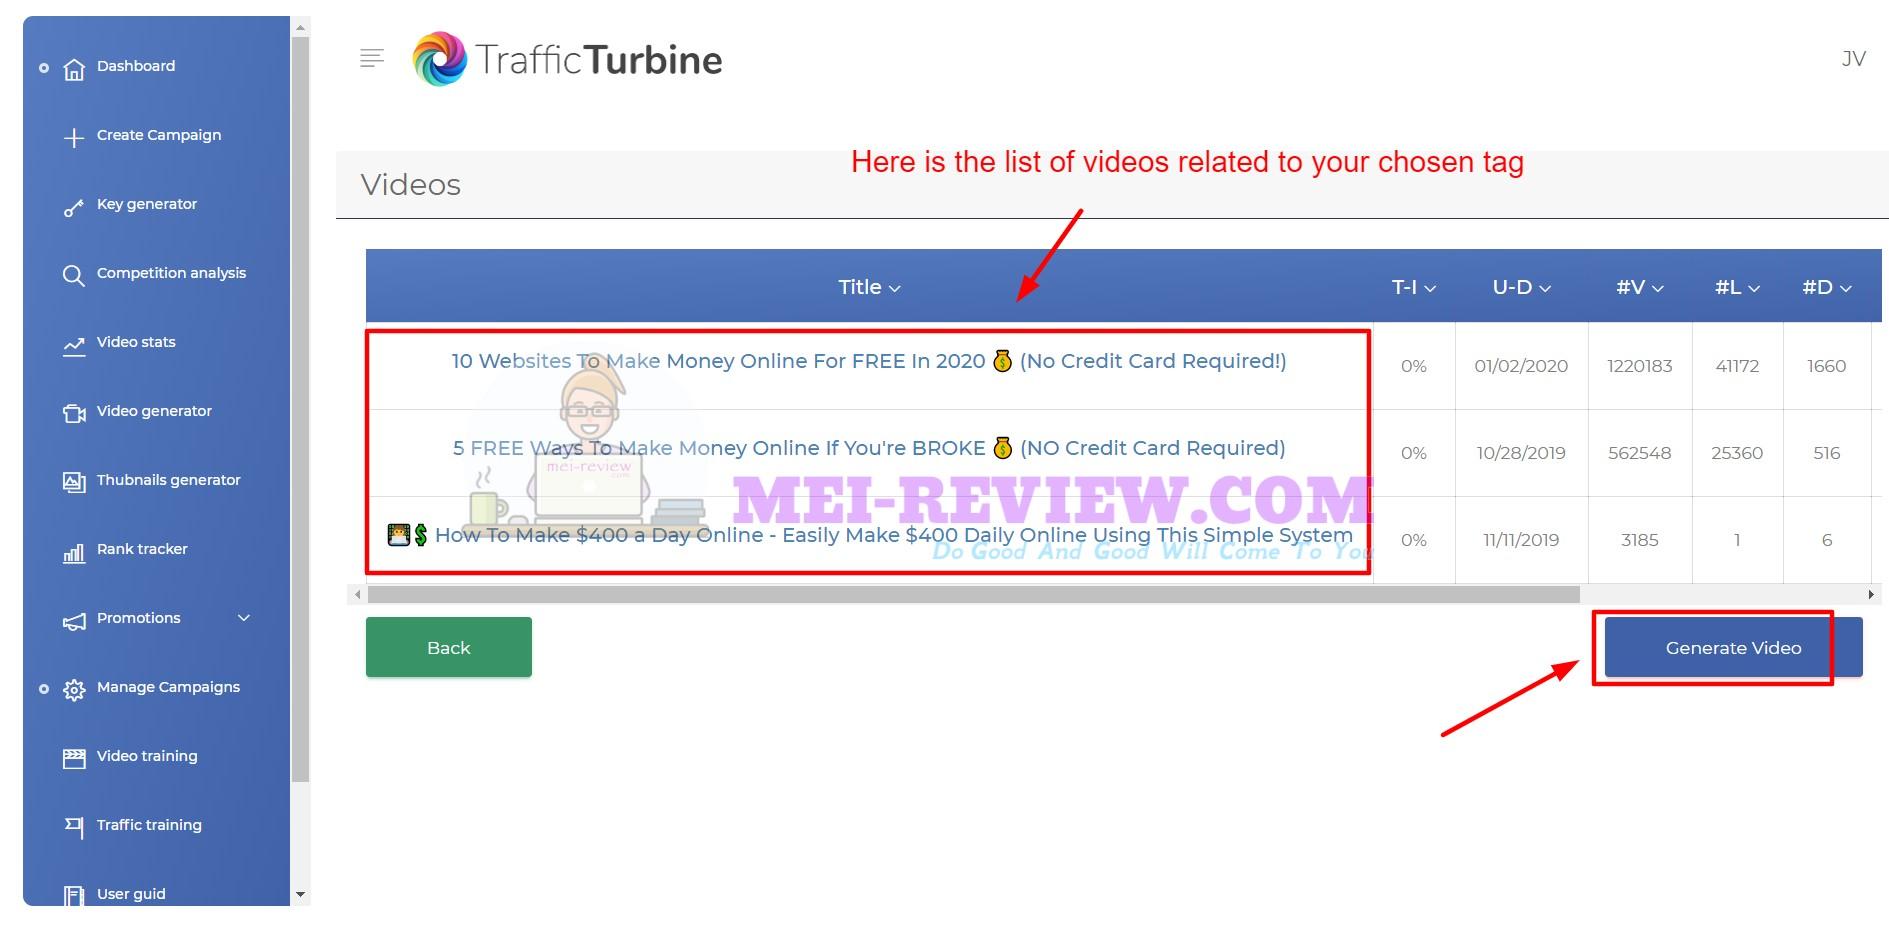 Traffic-Turbine-Demo-7